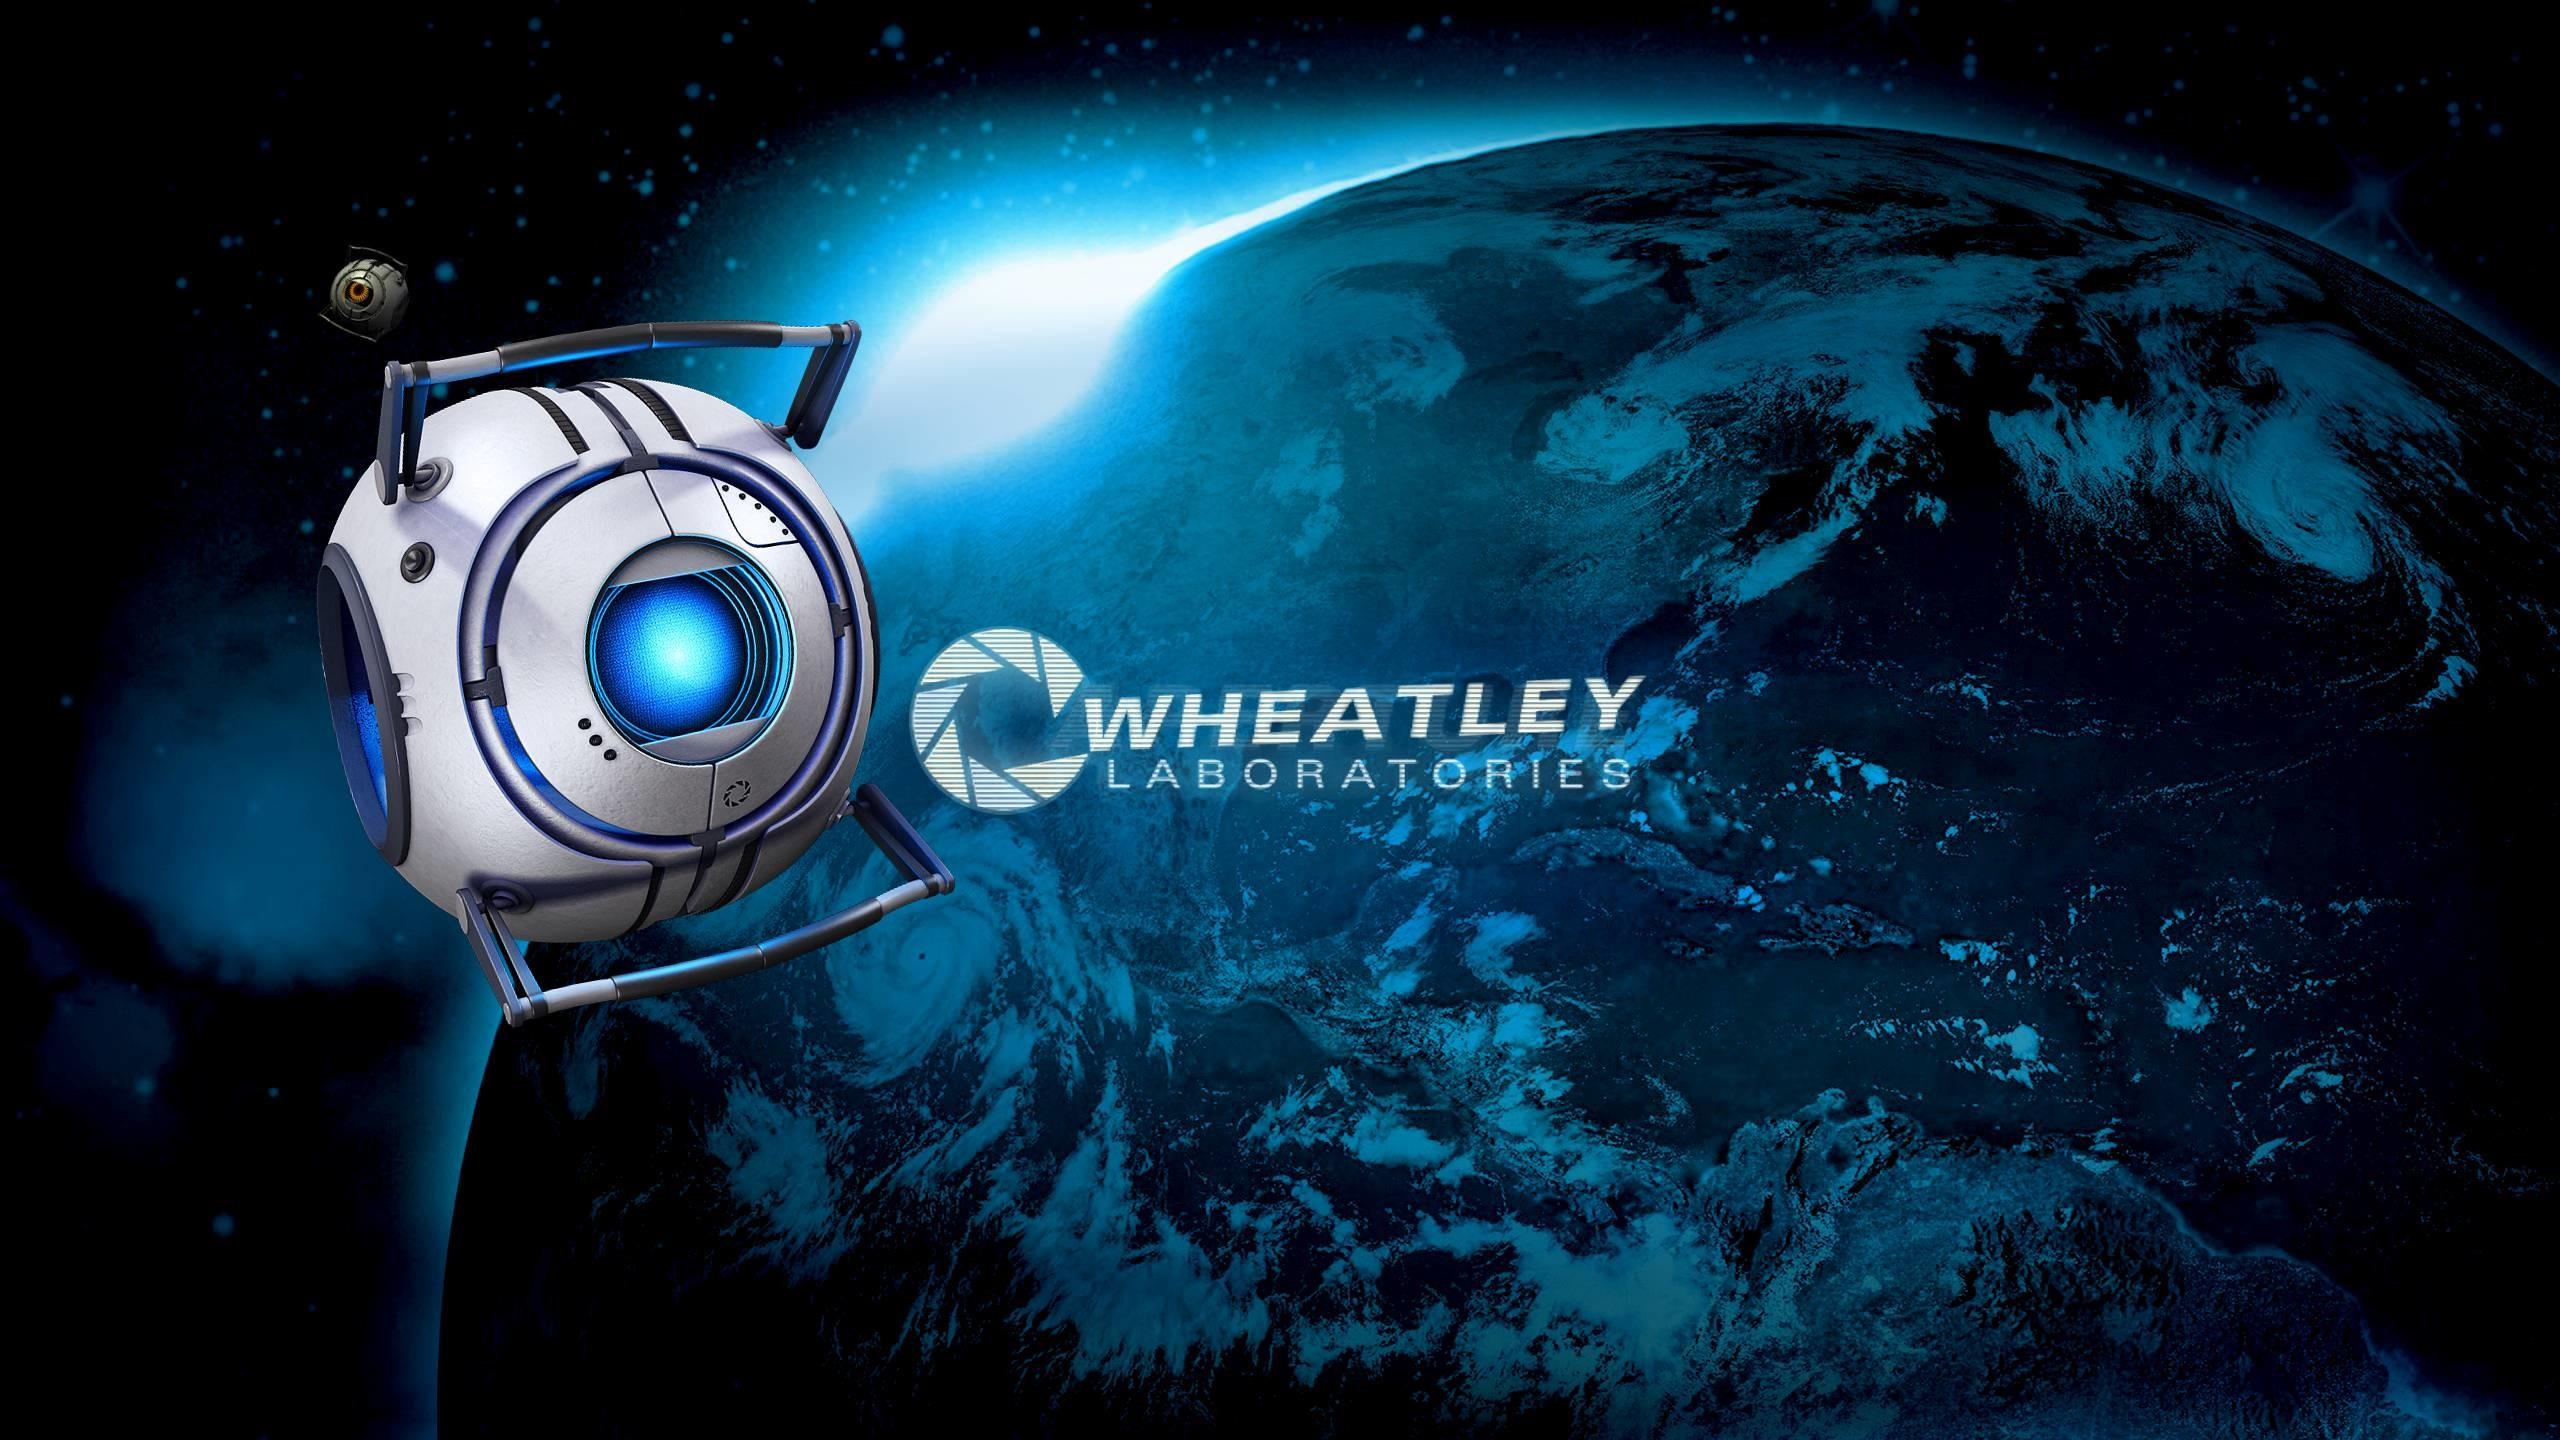 Portal 2 Animated Wallpapers for Windows : Portal